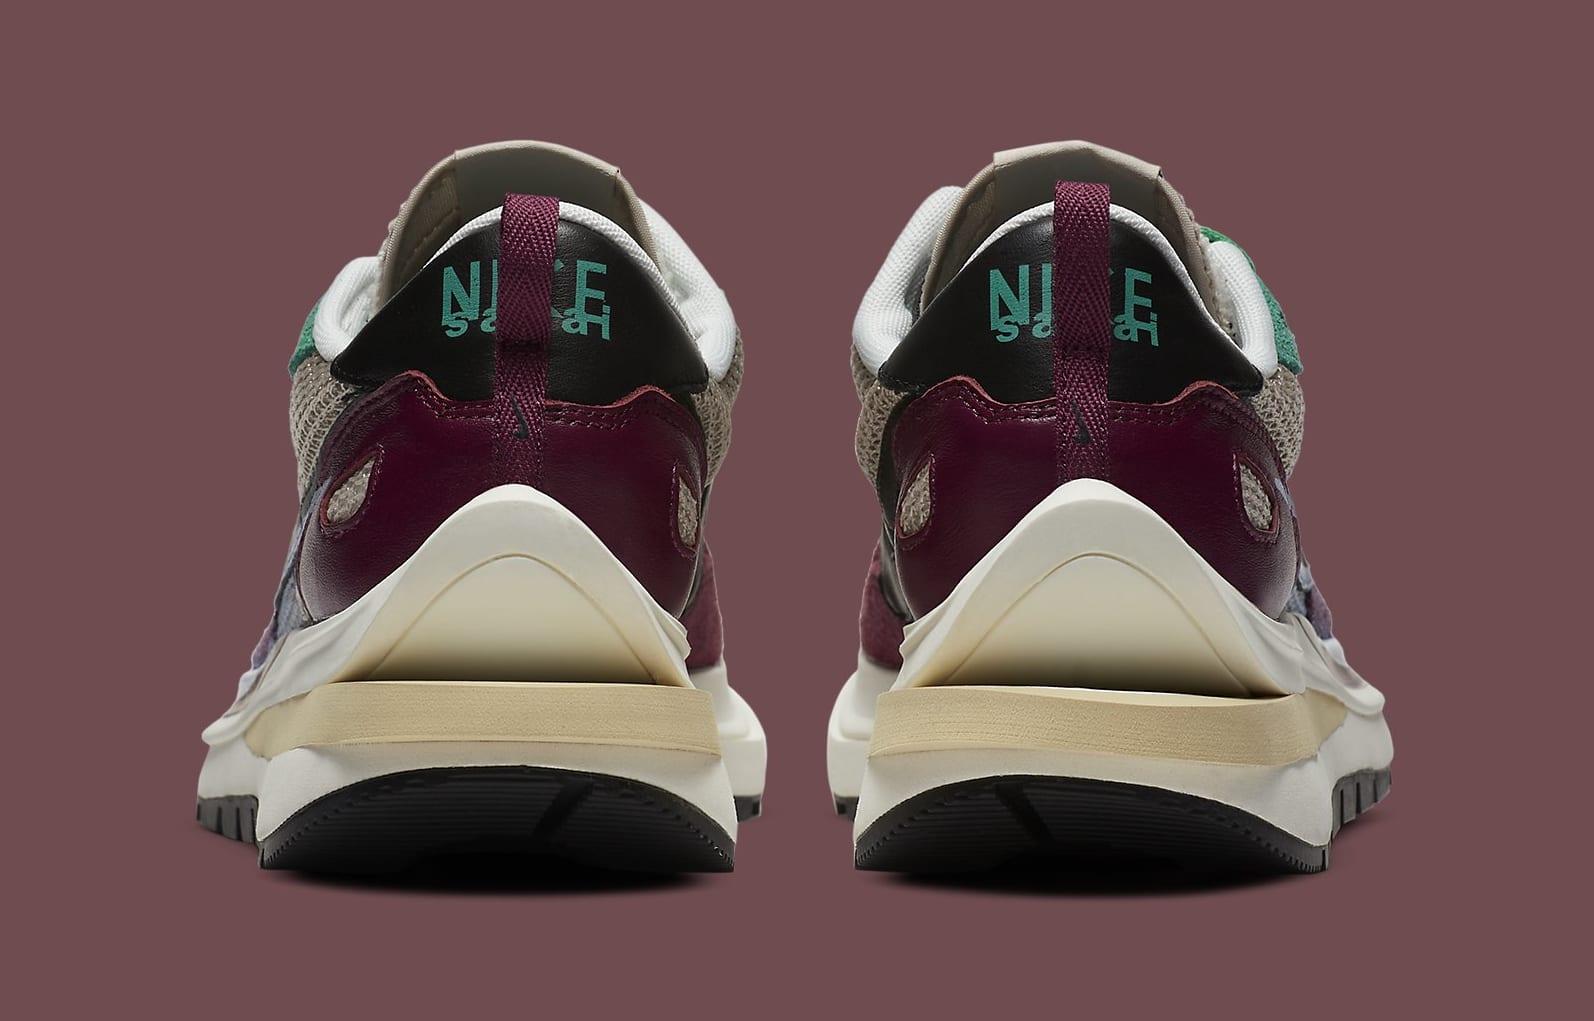 Sacai x Nike VaporWaffle 'Villain Red' DD3035-200 Heel